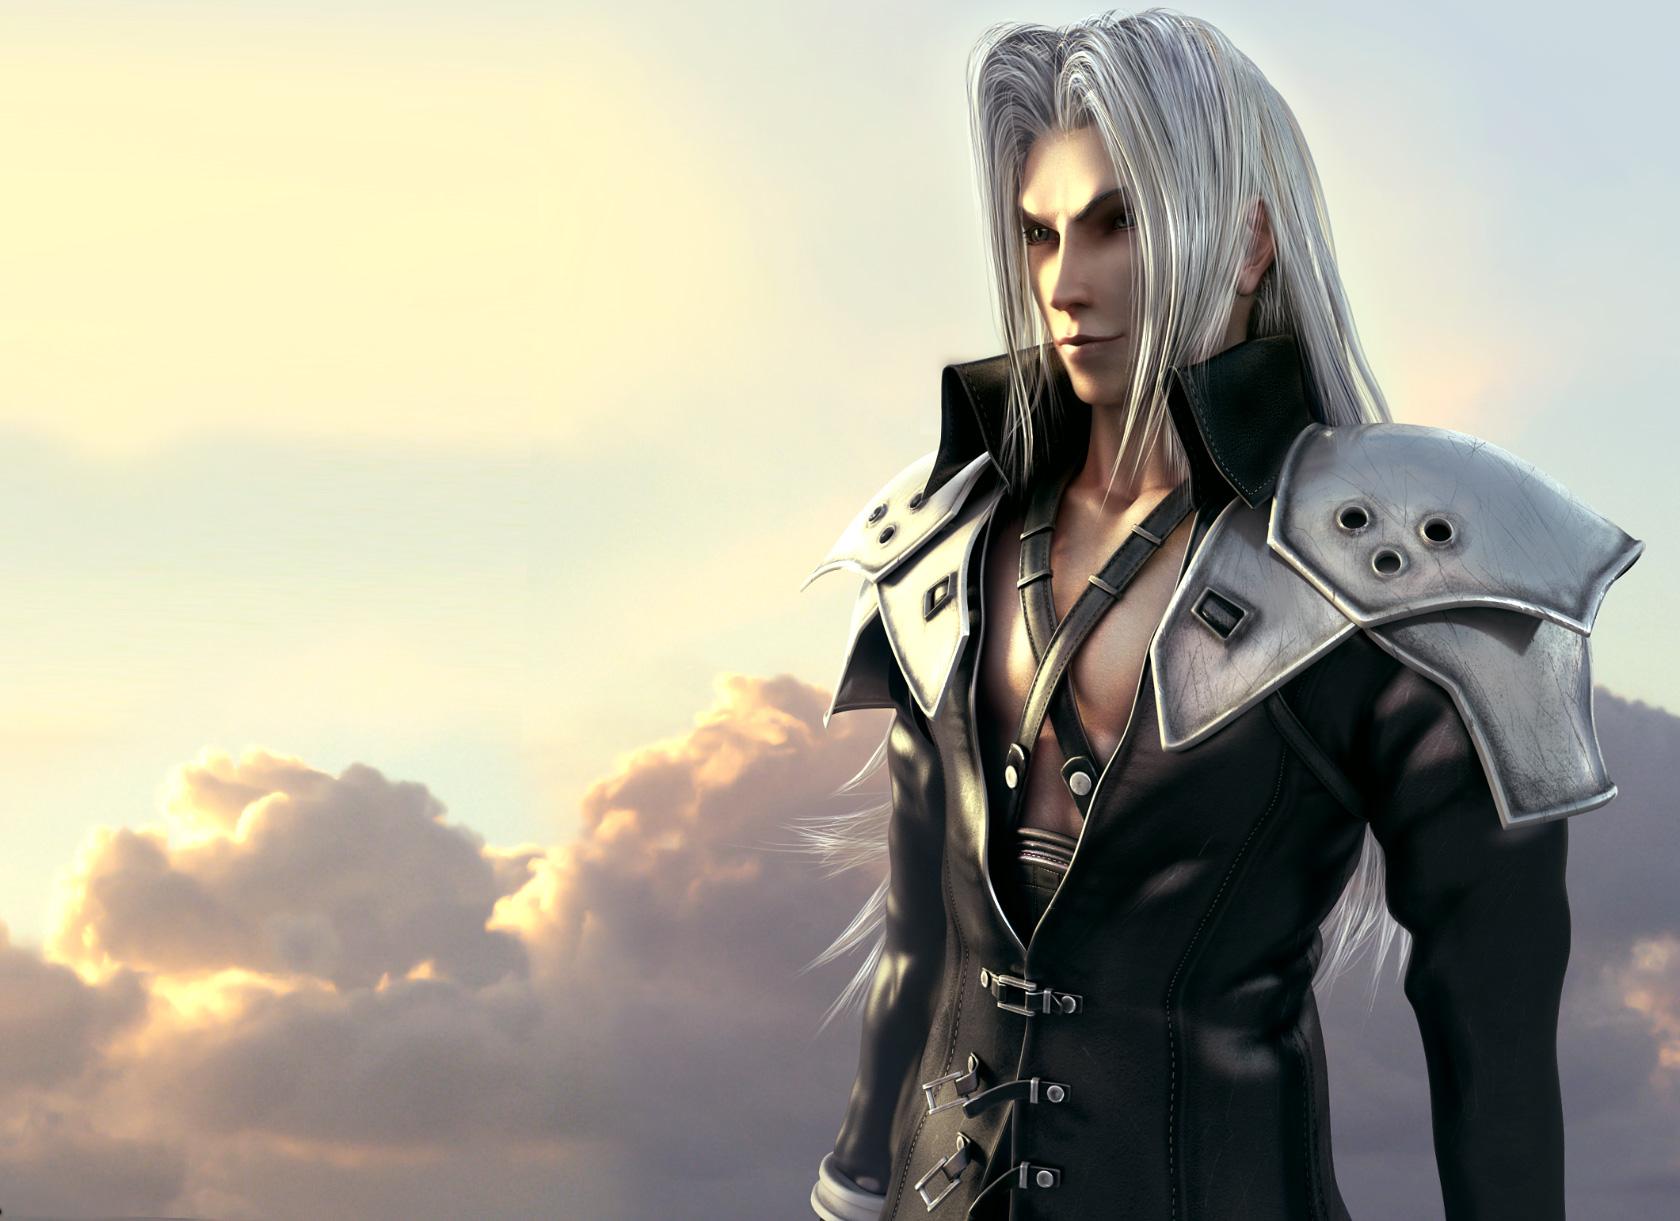 Wallpaper Final Fantasy Final Fantasy Vii Crisis Core Vdeo Game